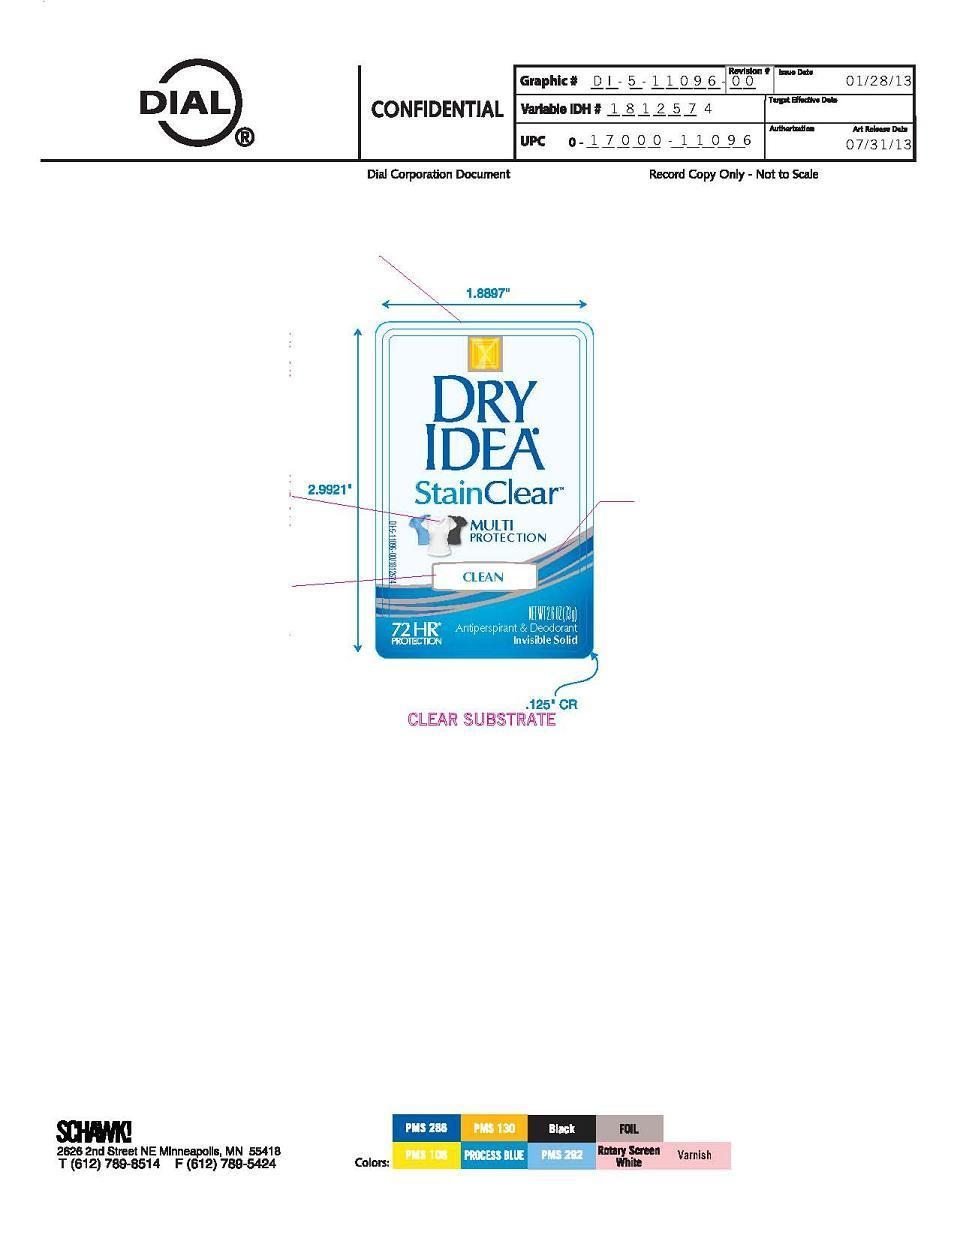 Dry Idea Clean (Aluminum Zirconium Tetrachlorohydrex Gly 19.0%) Stick [Vvf Illinois Services]